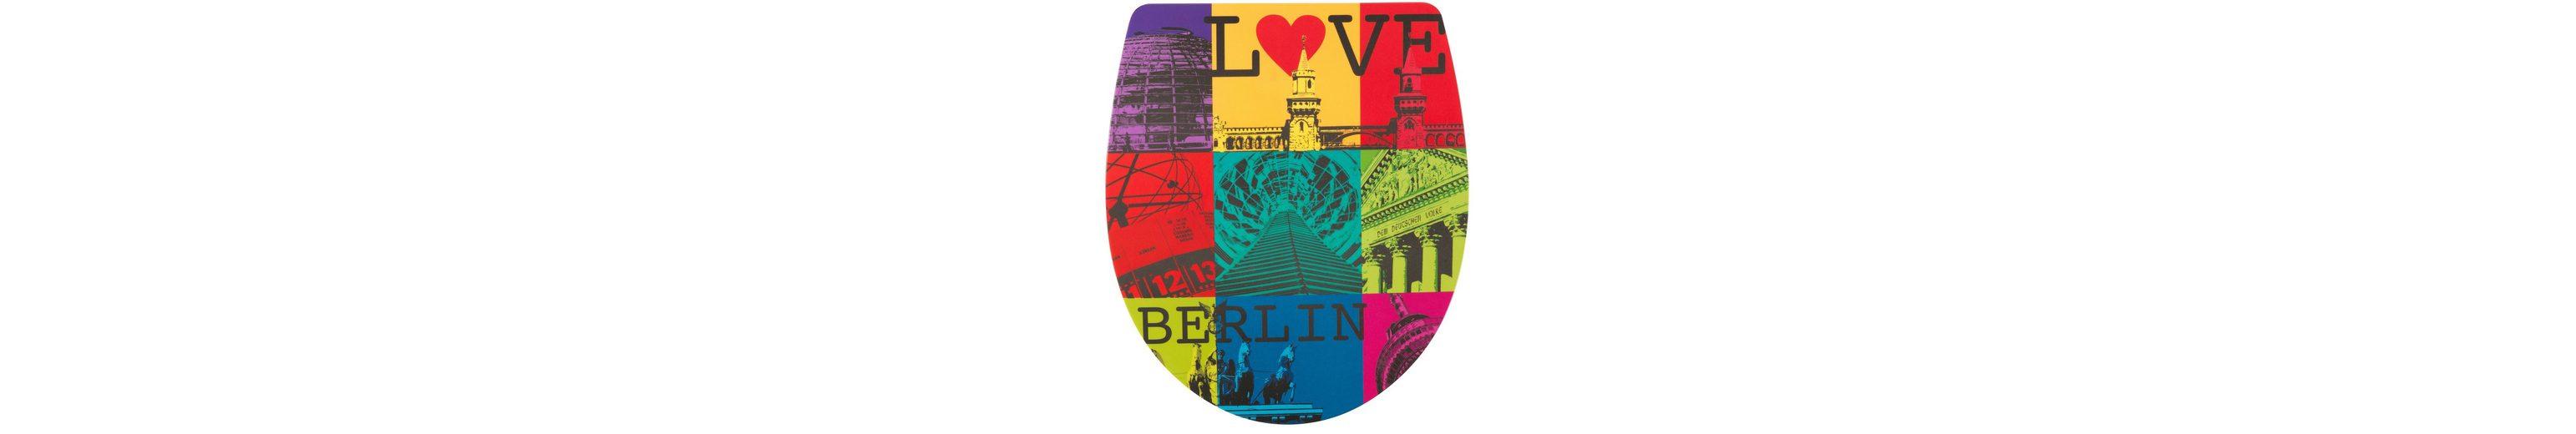 WC-Sitz »Imola Love Berlin«, Mit Absenkautomatik